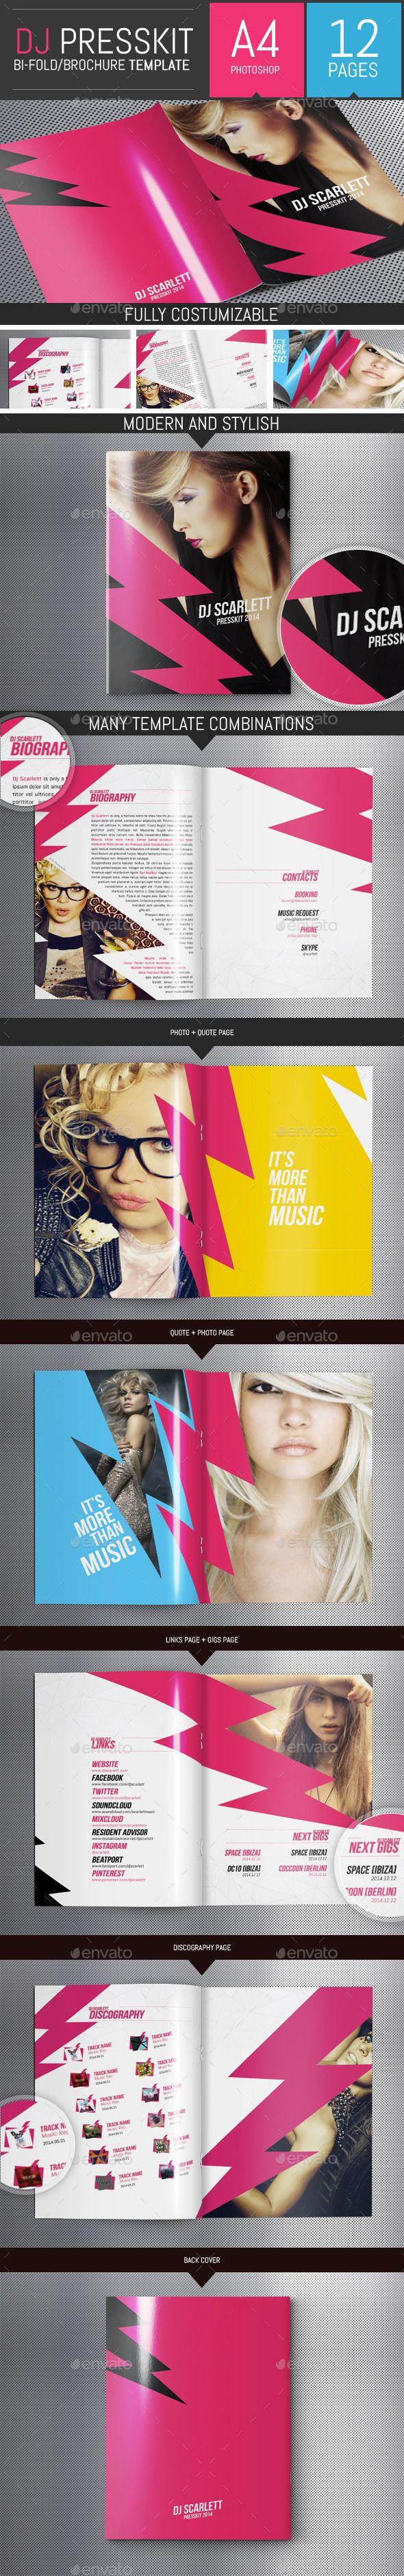 Let's Rock! - Dj / Musician Press Kit PSD Template